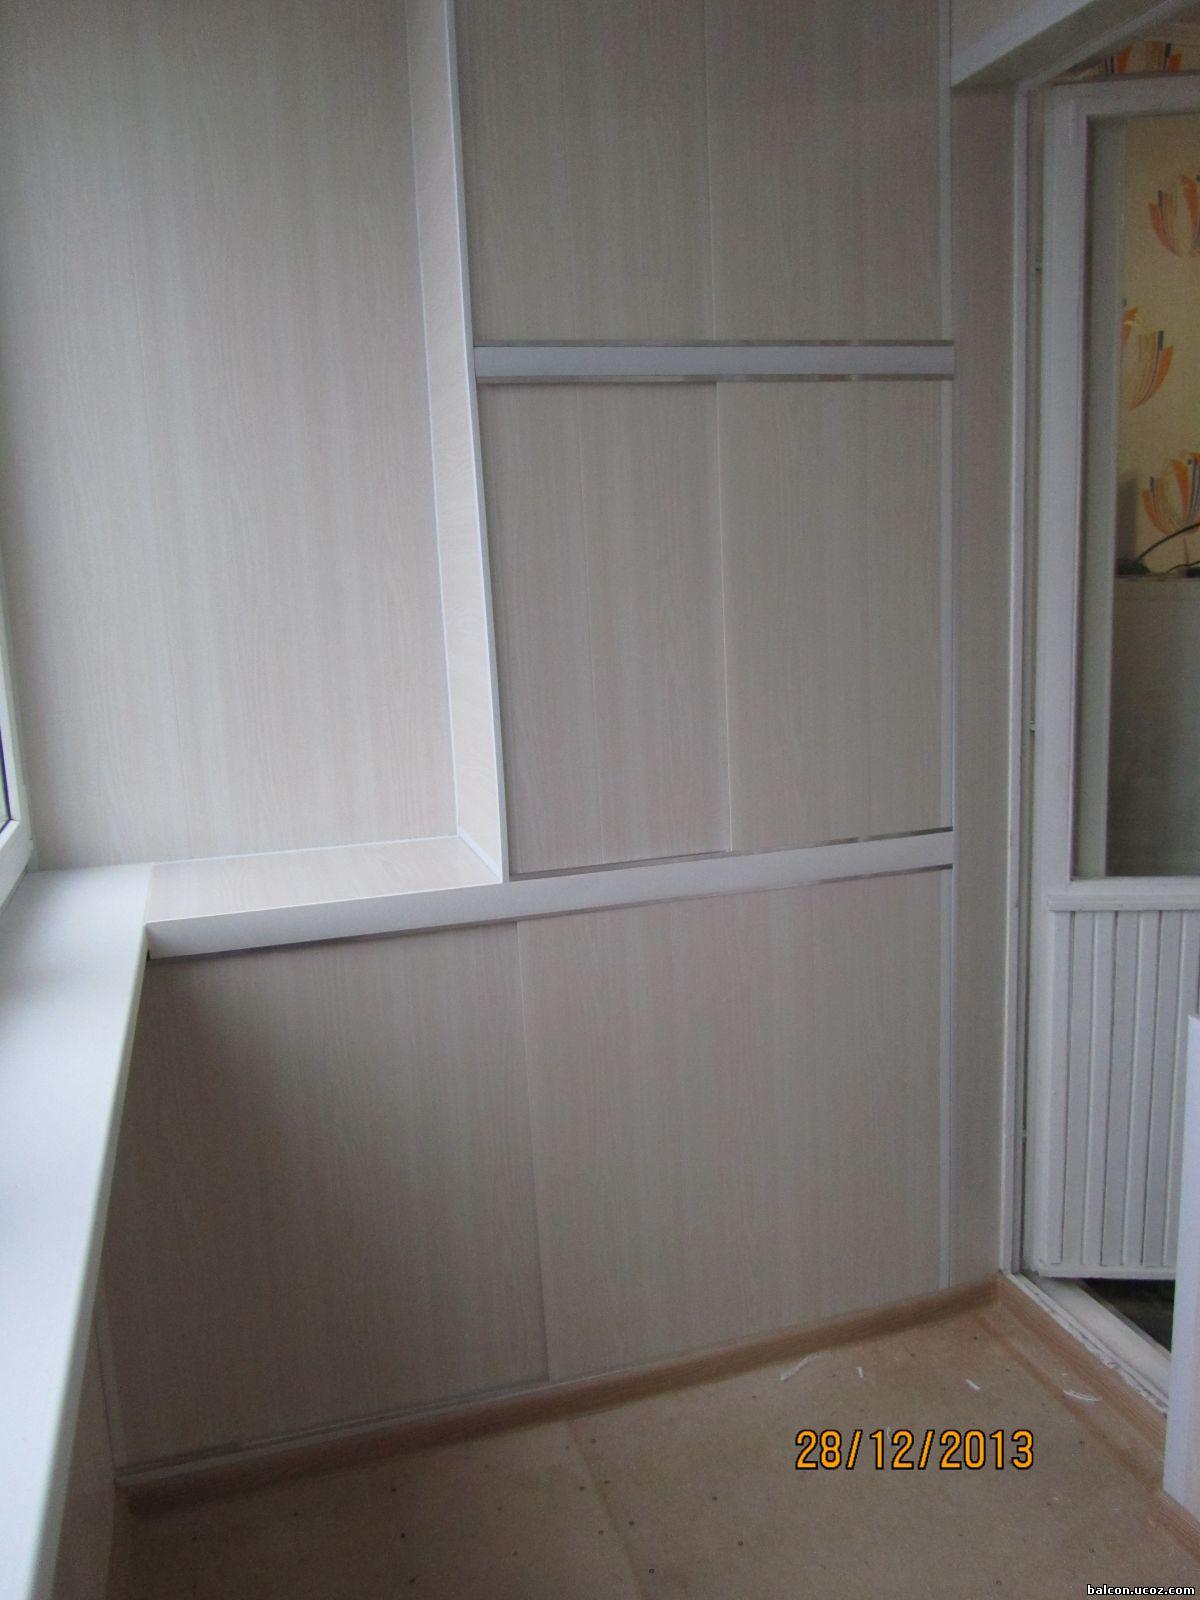 Шкаф из панелей пвх на балкон своими руками 4